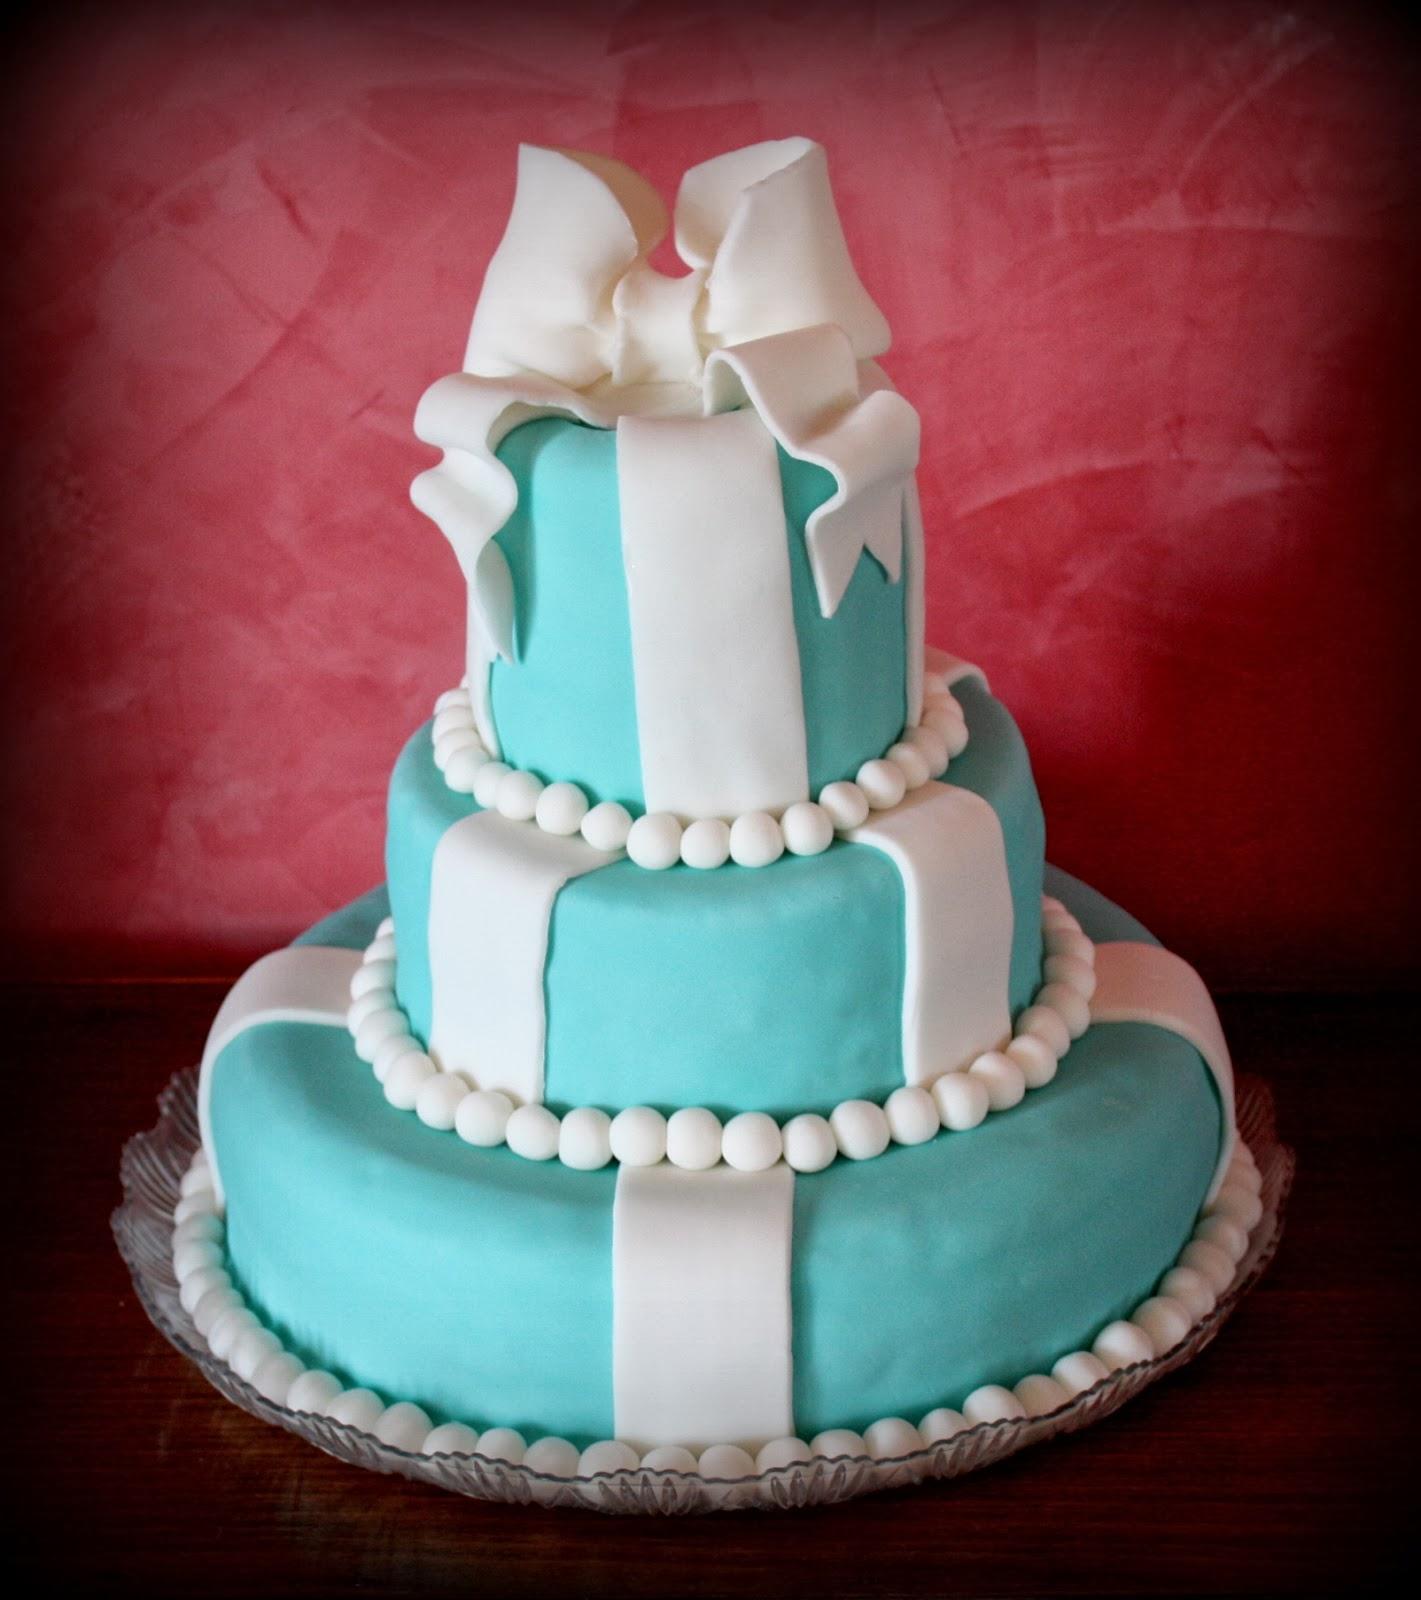 Claudia cakes torta tiffany 3 piani for 30x30 piani di piani a 2 piani